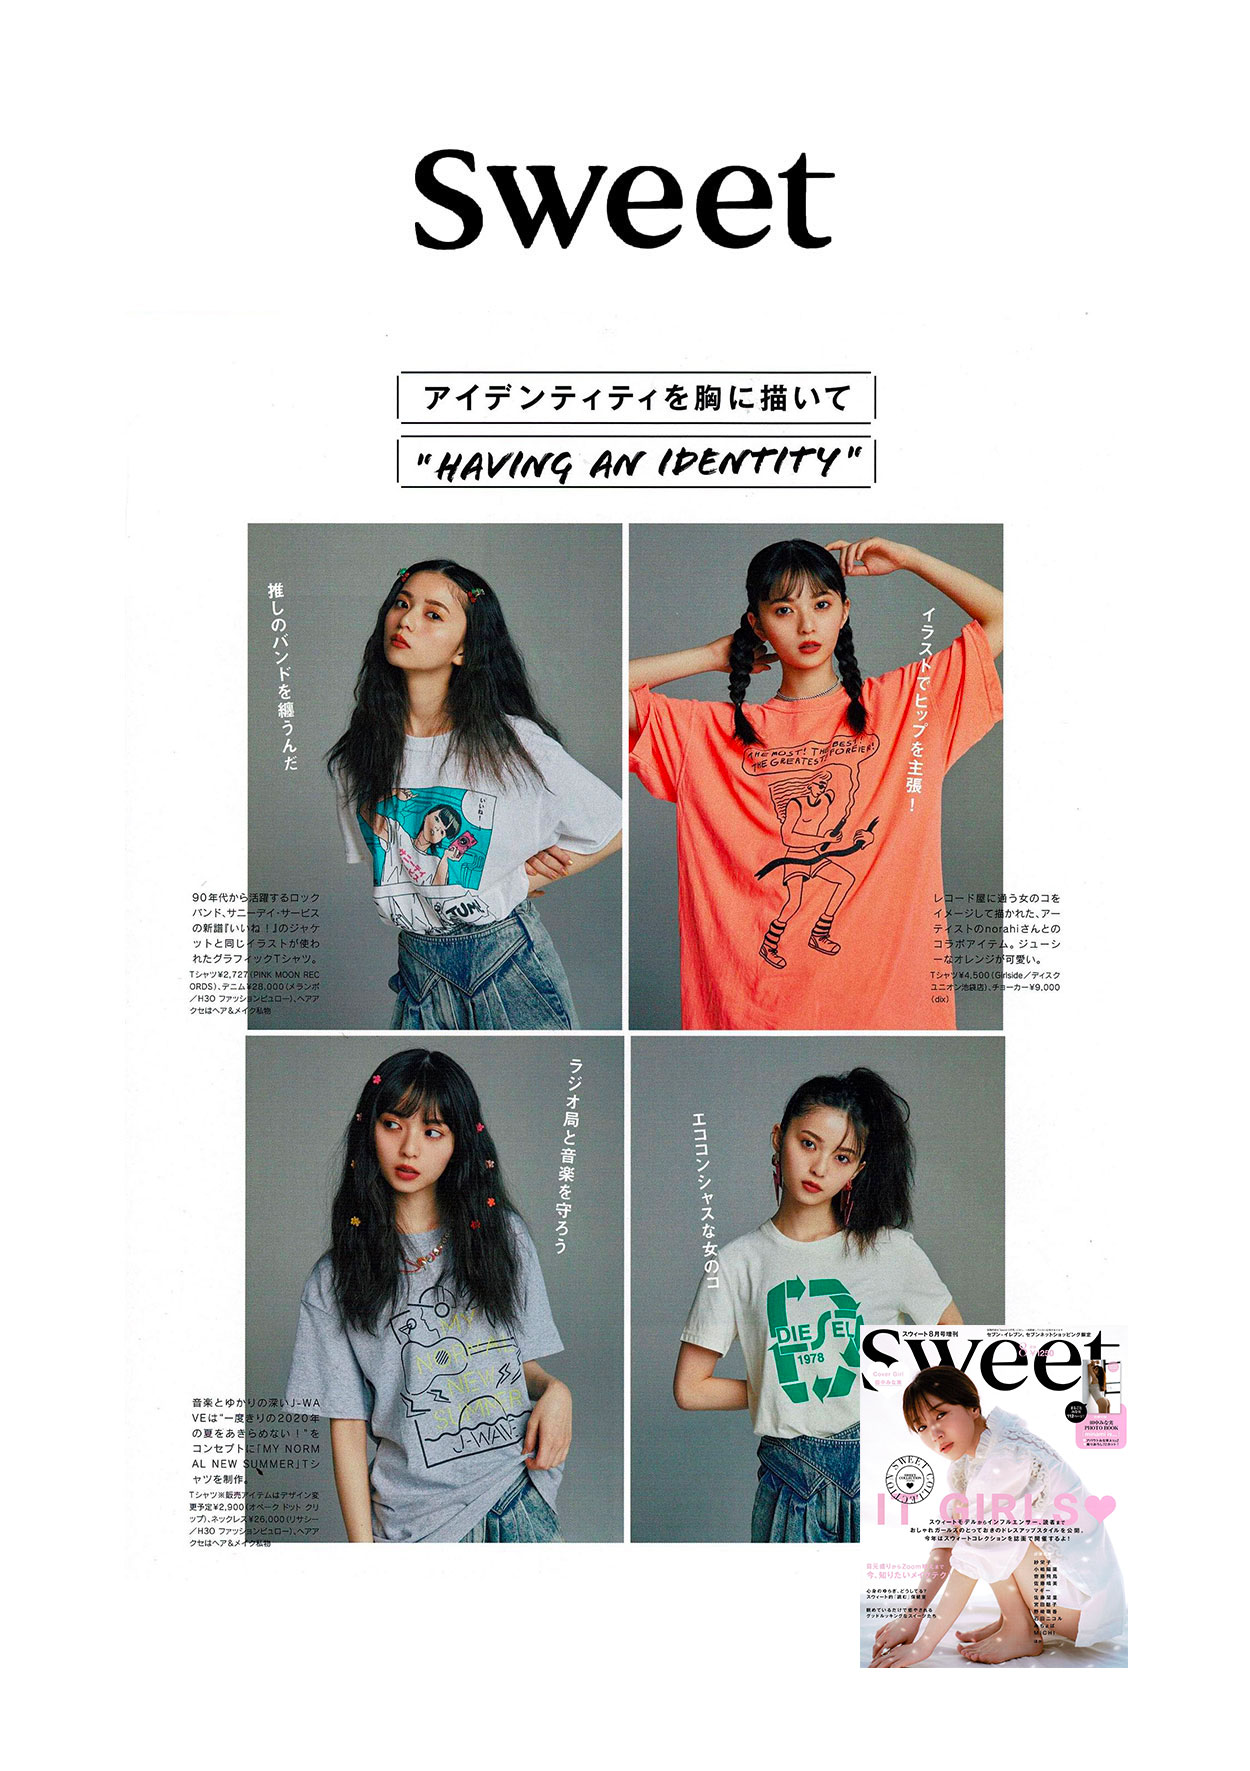 melampo-press-sweet-japan-magazine3